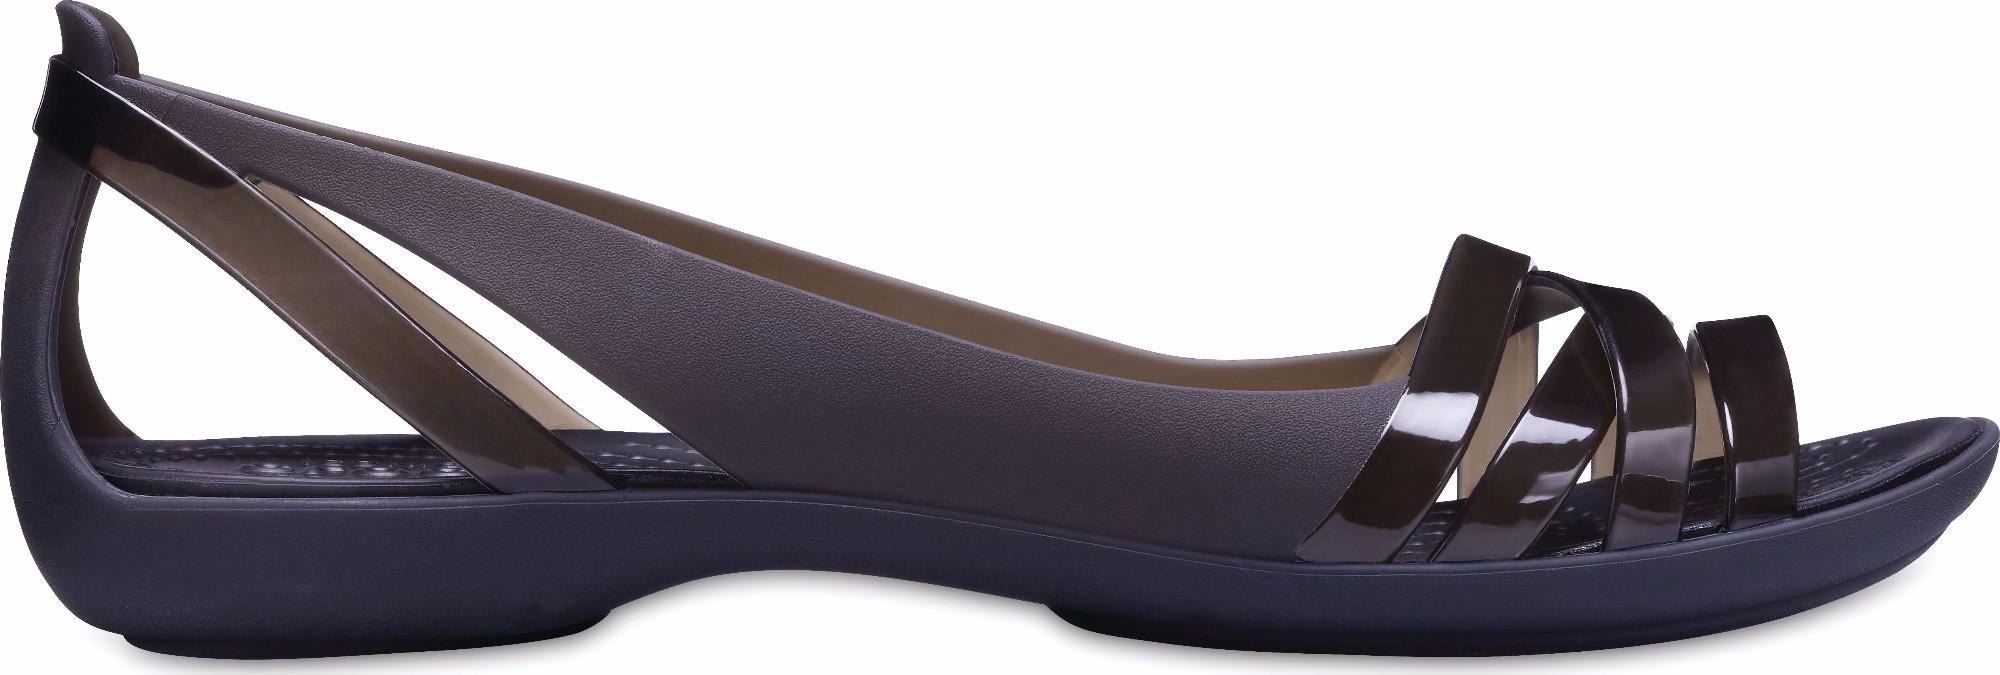 Crocs™ Isabella Huarache II Flat Black/Black 39,5